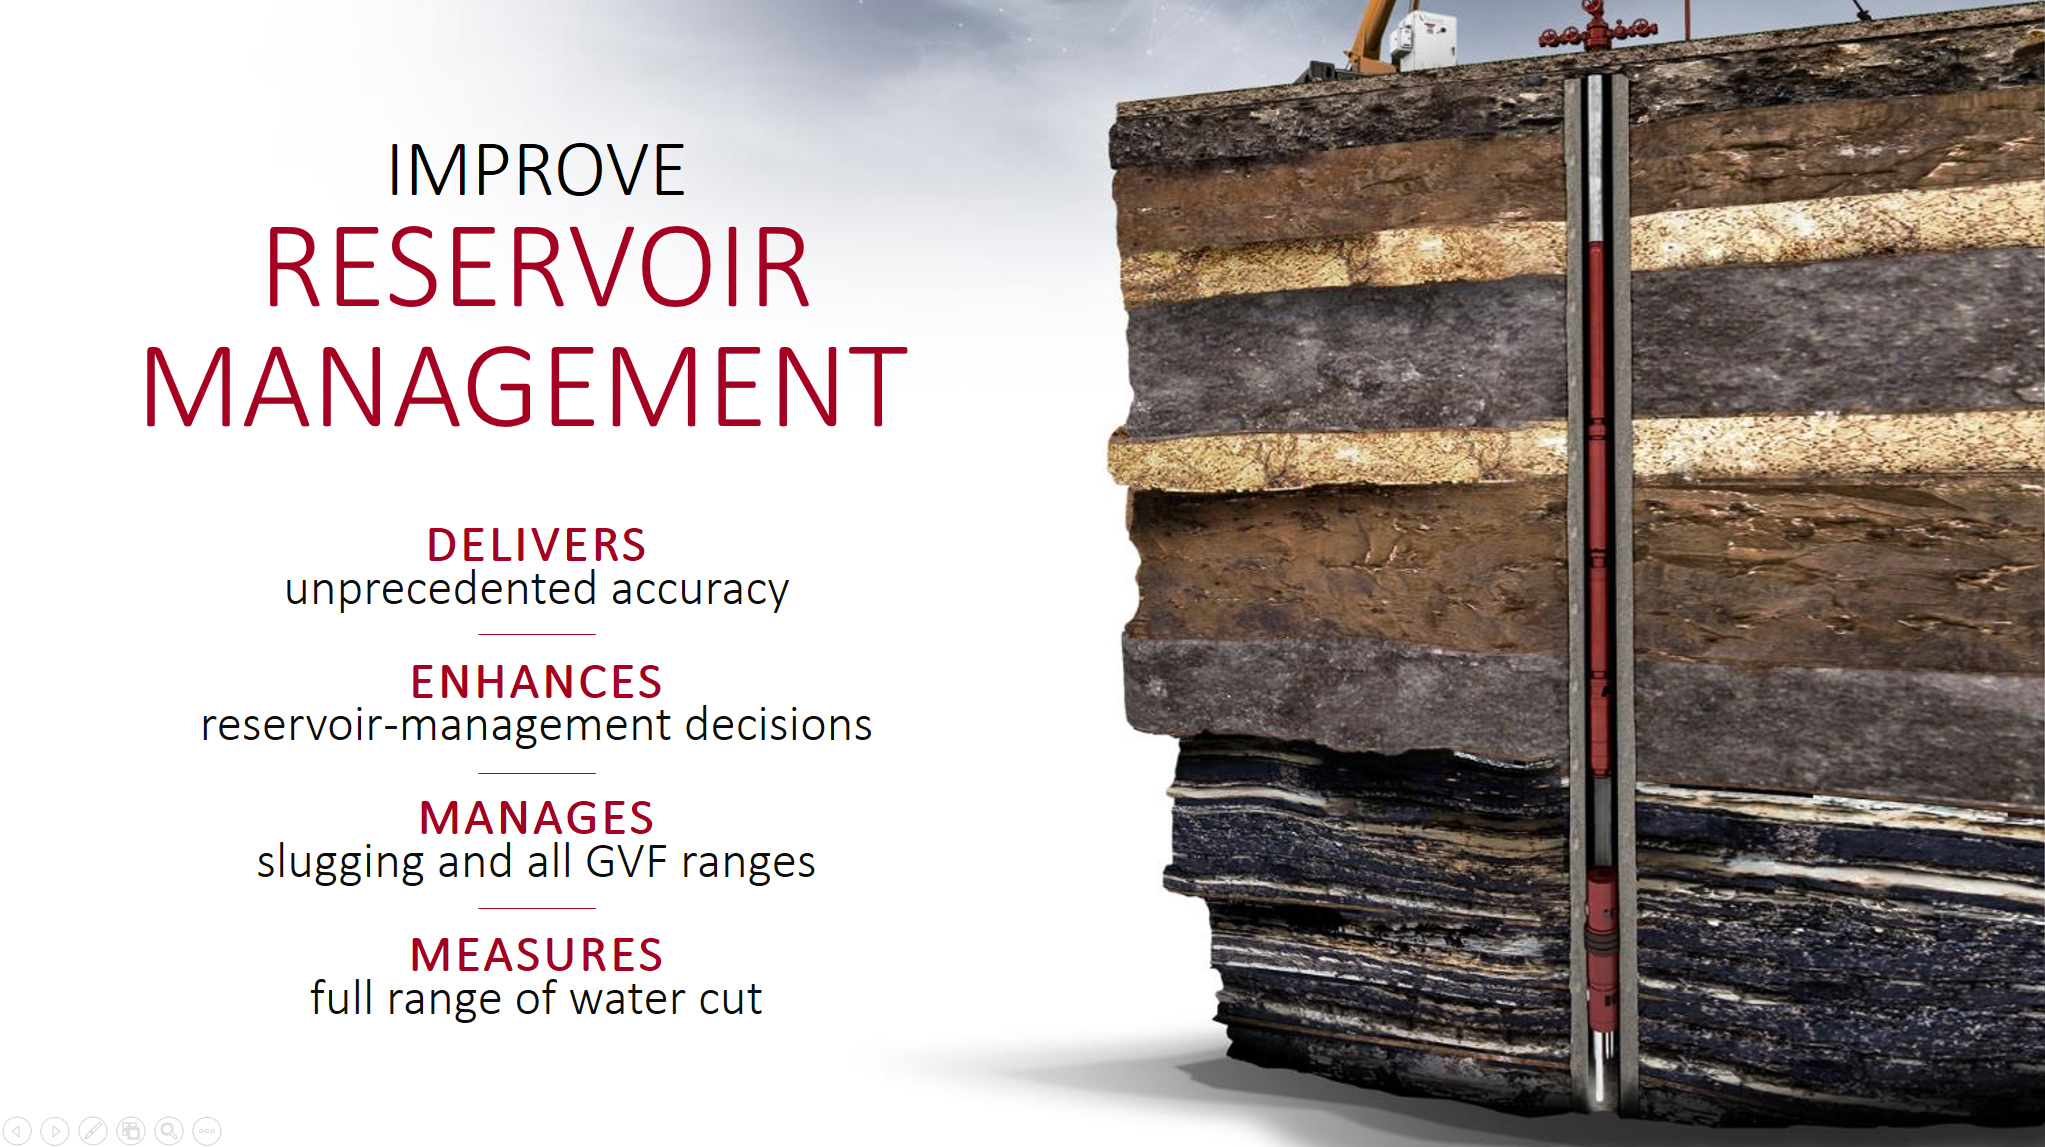 Improve reservoir management